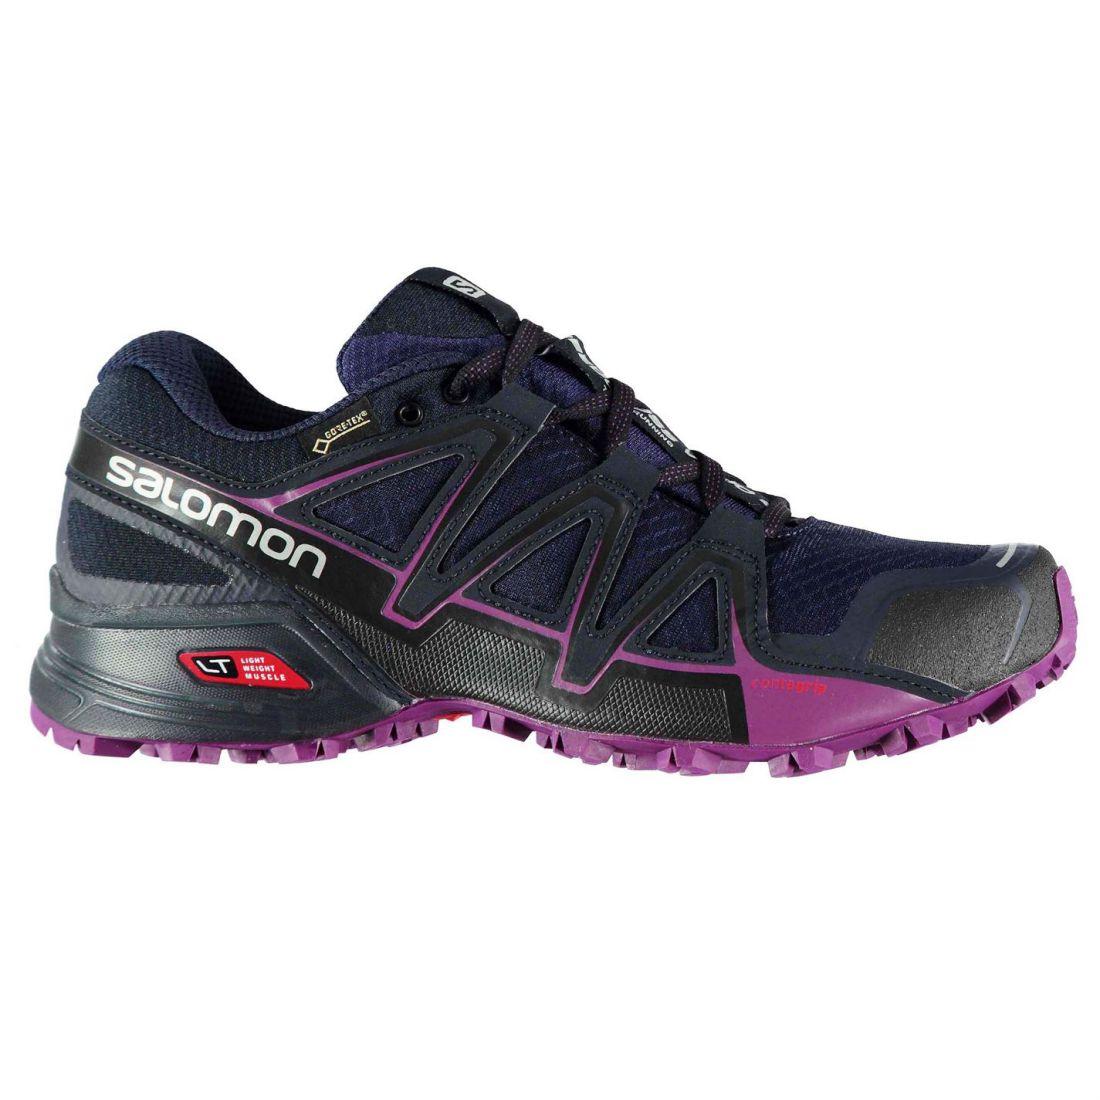 SALOMON SPEEDCROSS V GTX Trail Running Shoes Ladies Ventilated Water Repellent